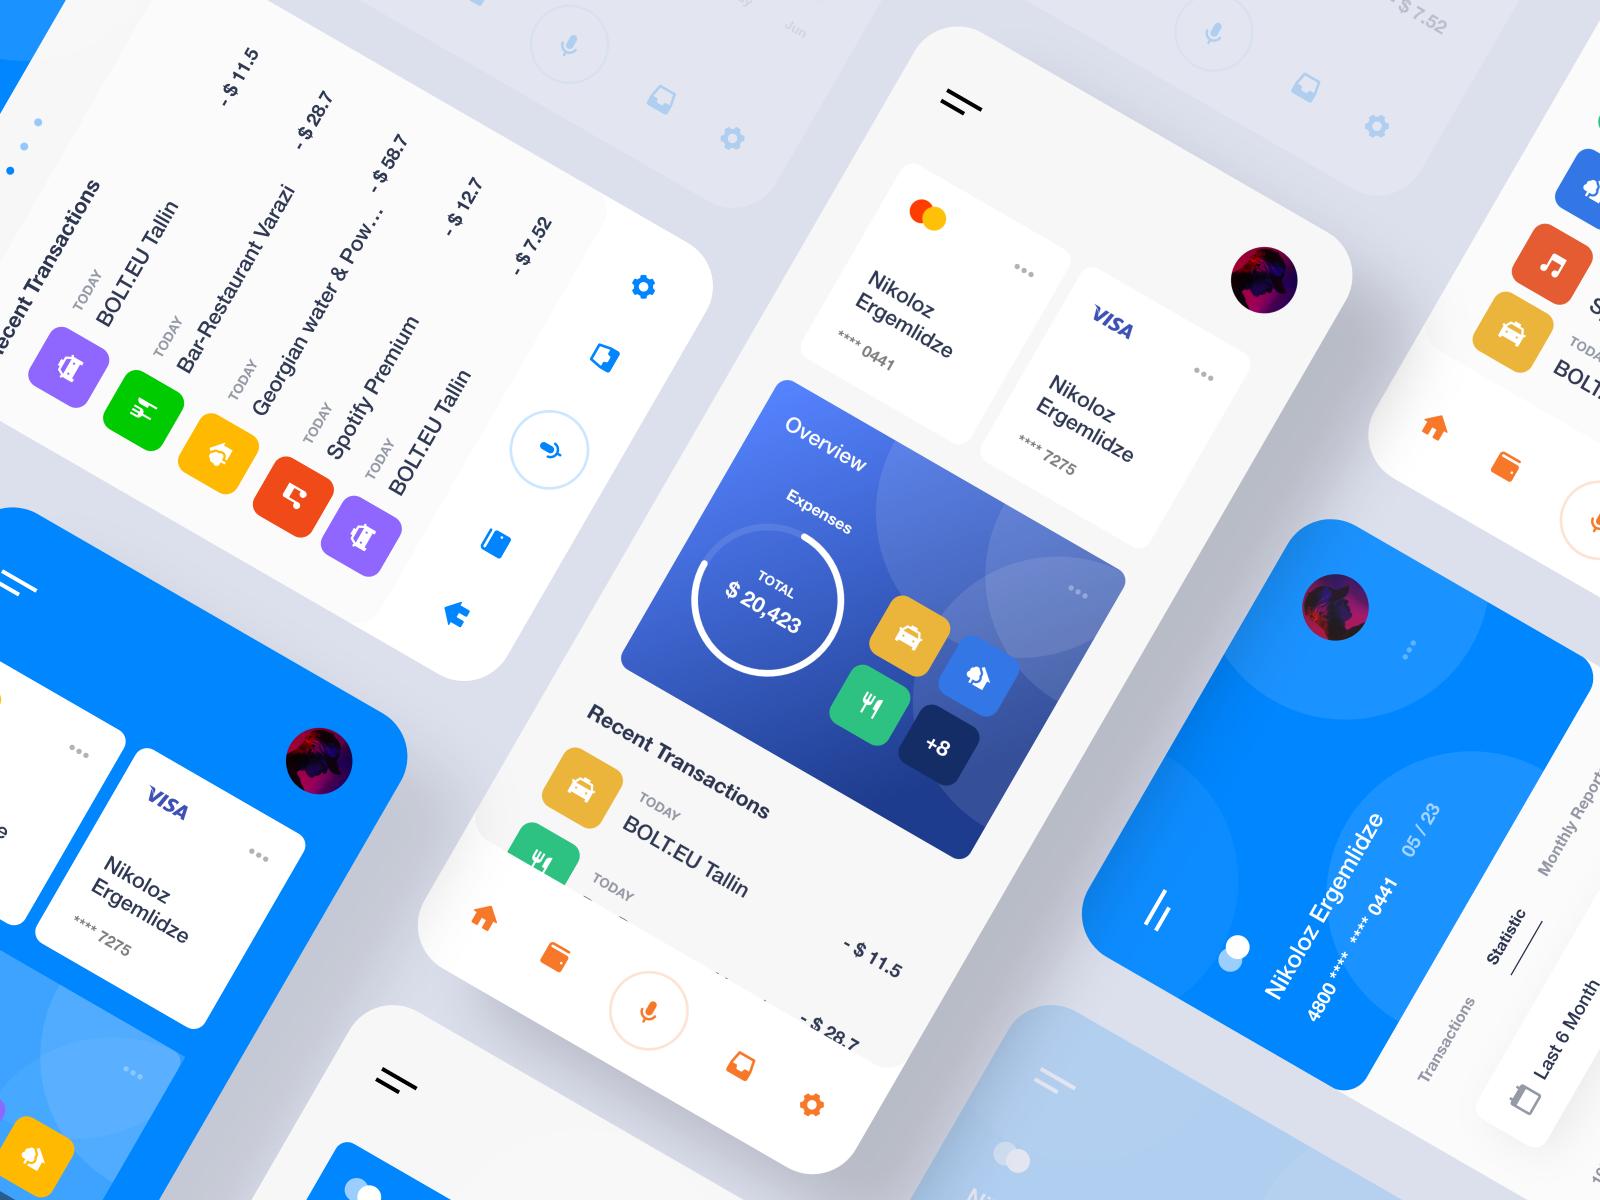 Banking Mobile Design Inspiration Mobile App Graphic Design Services